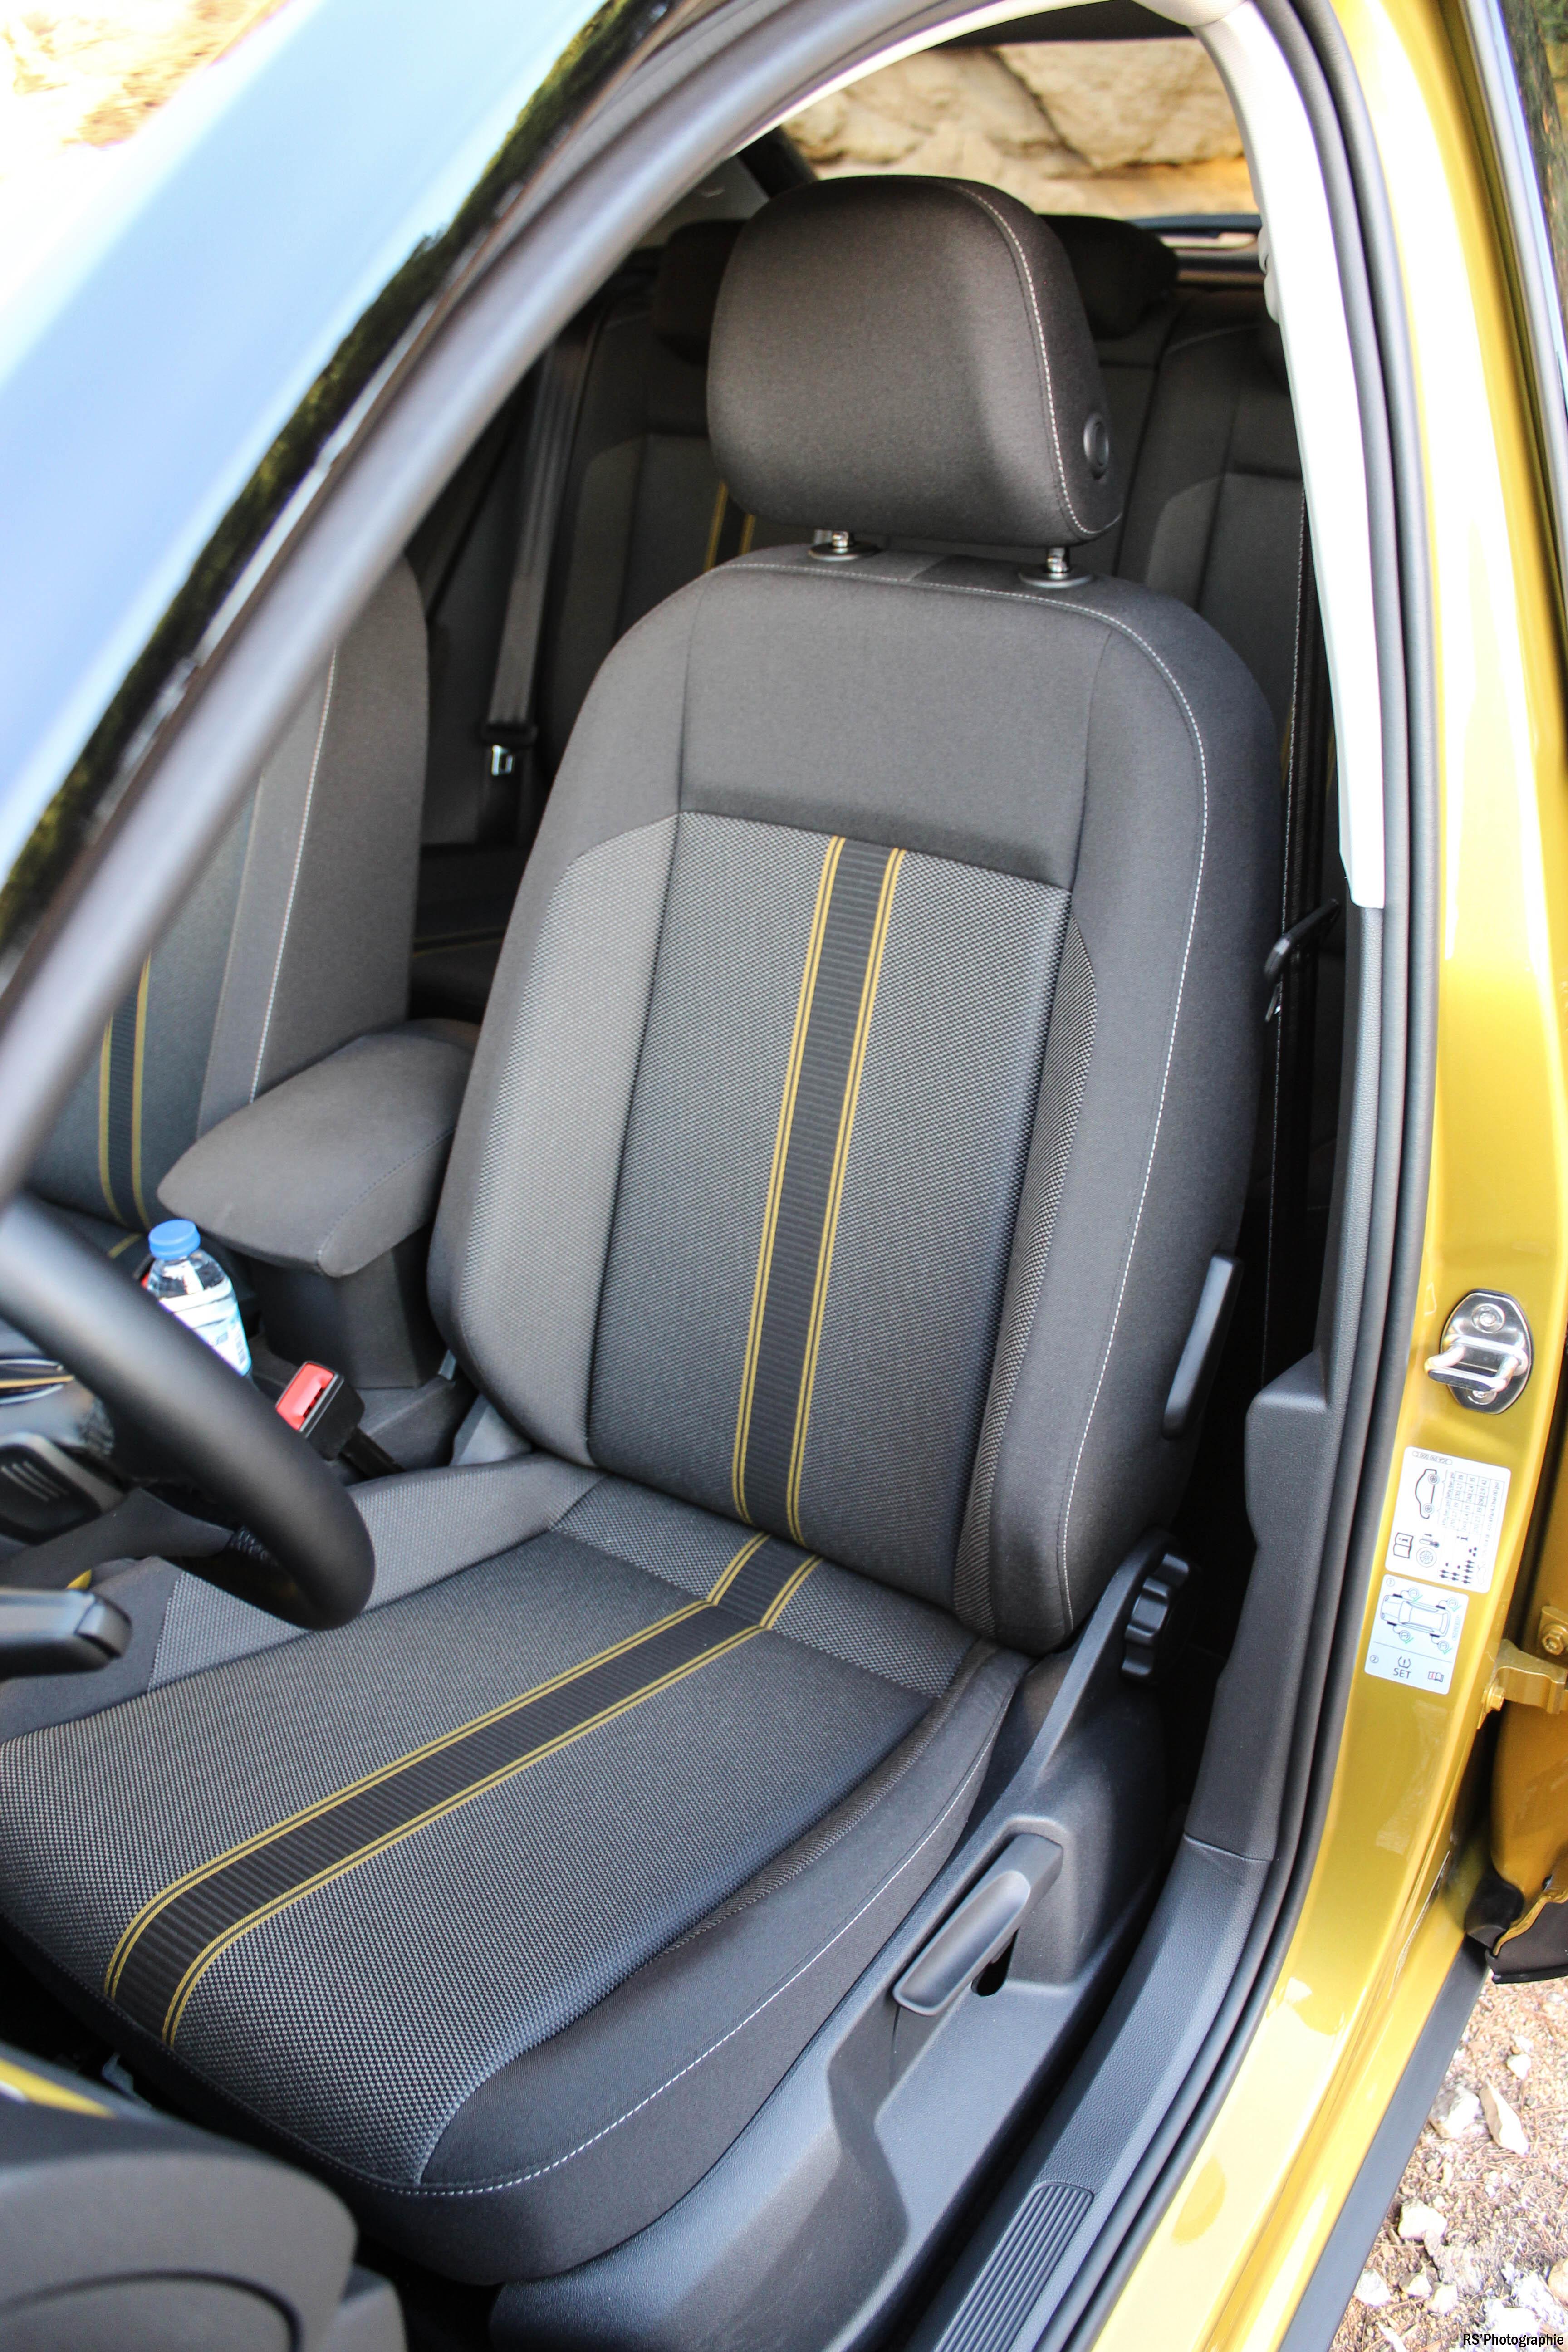 Volkswagentroc75-vw-t-roc-intérieur-onboard-Arnaud Demasier-RSPhotographie